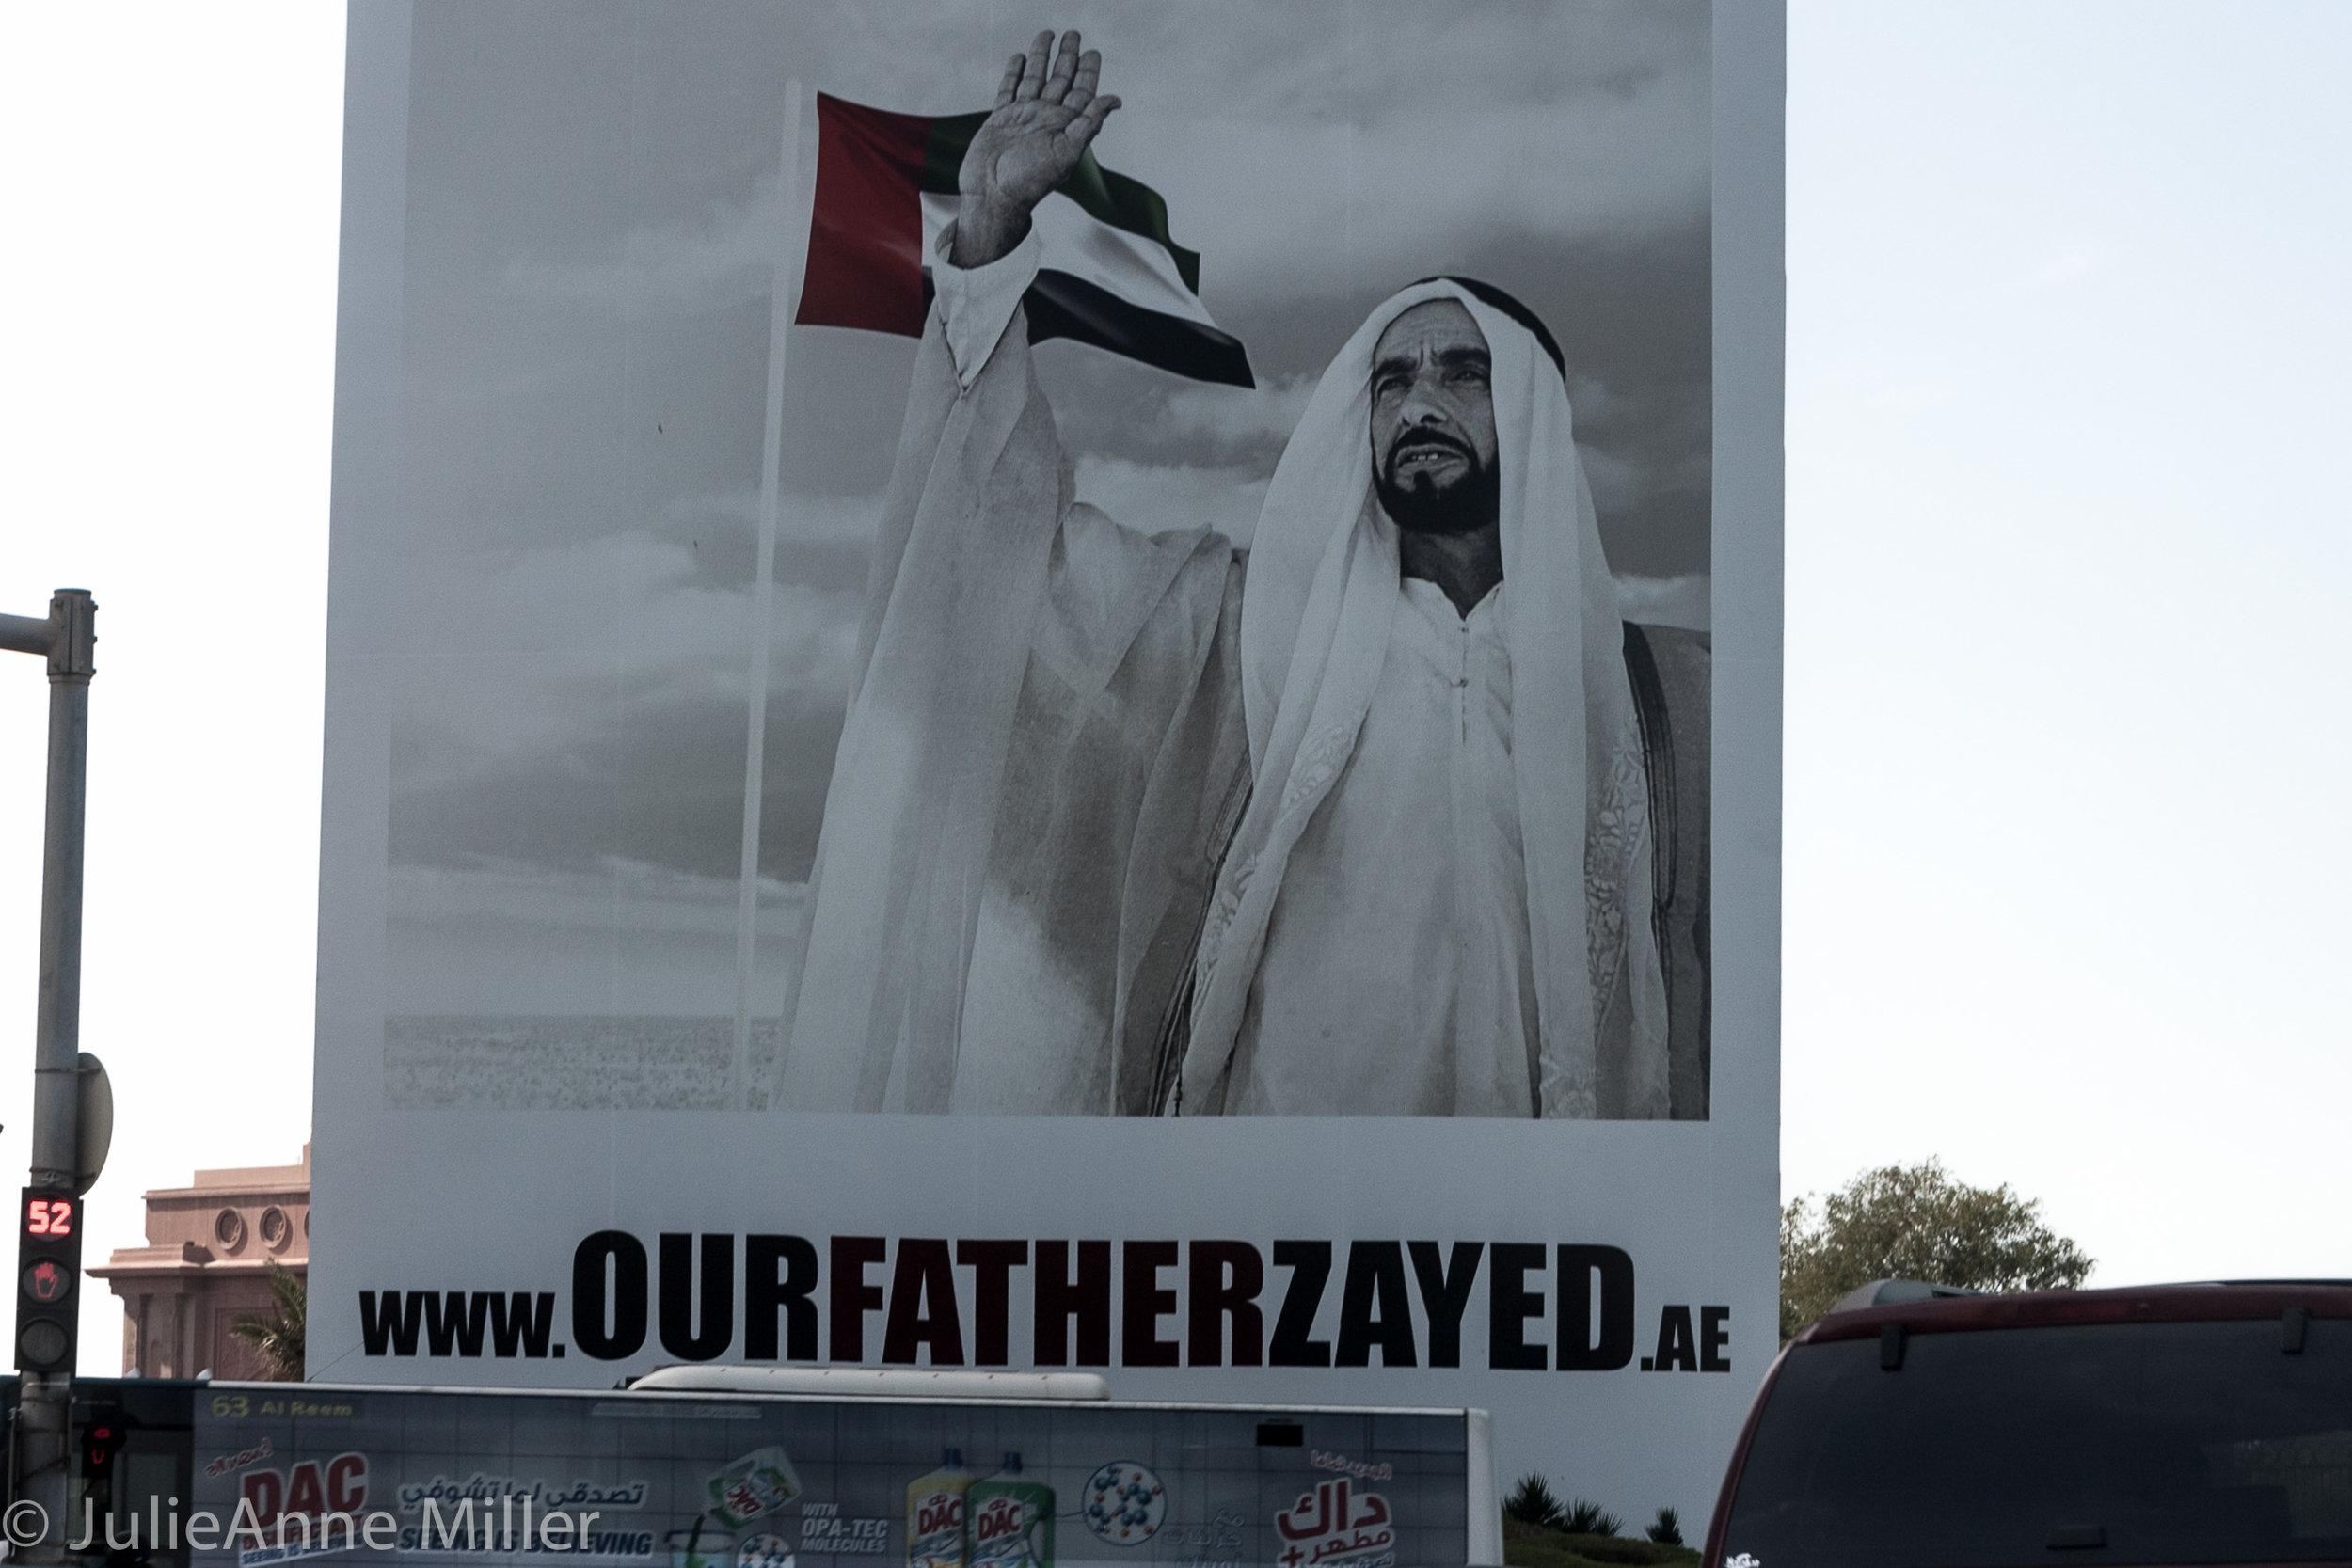 UAE Father Zayed bin Sultan Al Nahyan